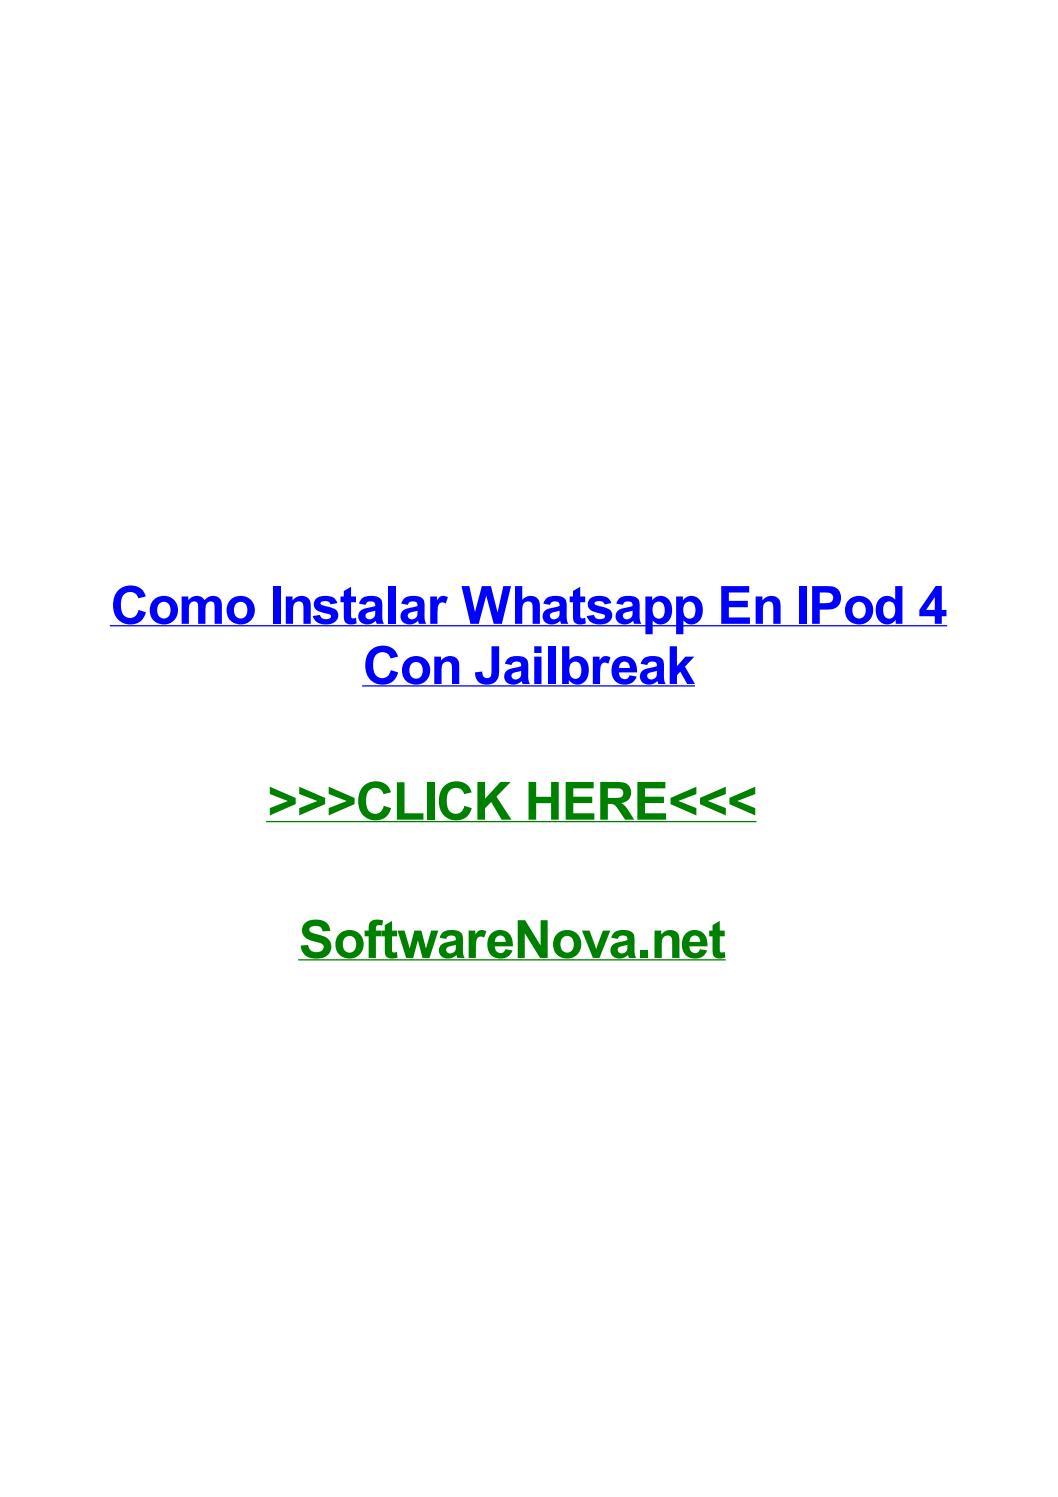 Como Instalar Whatsapp En Ipod 4 Con Jailbreak By Betsybbnvu